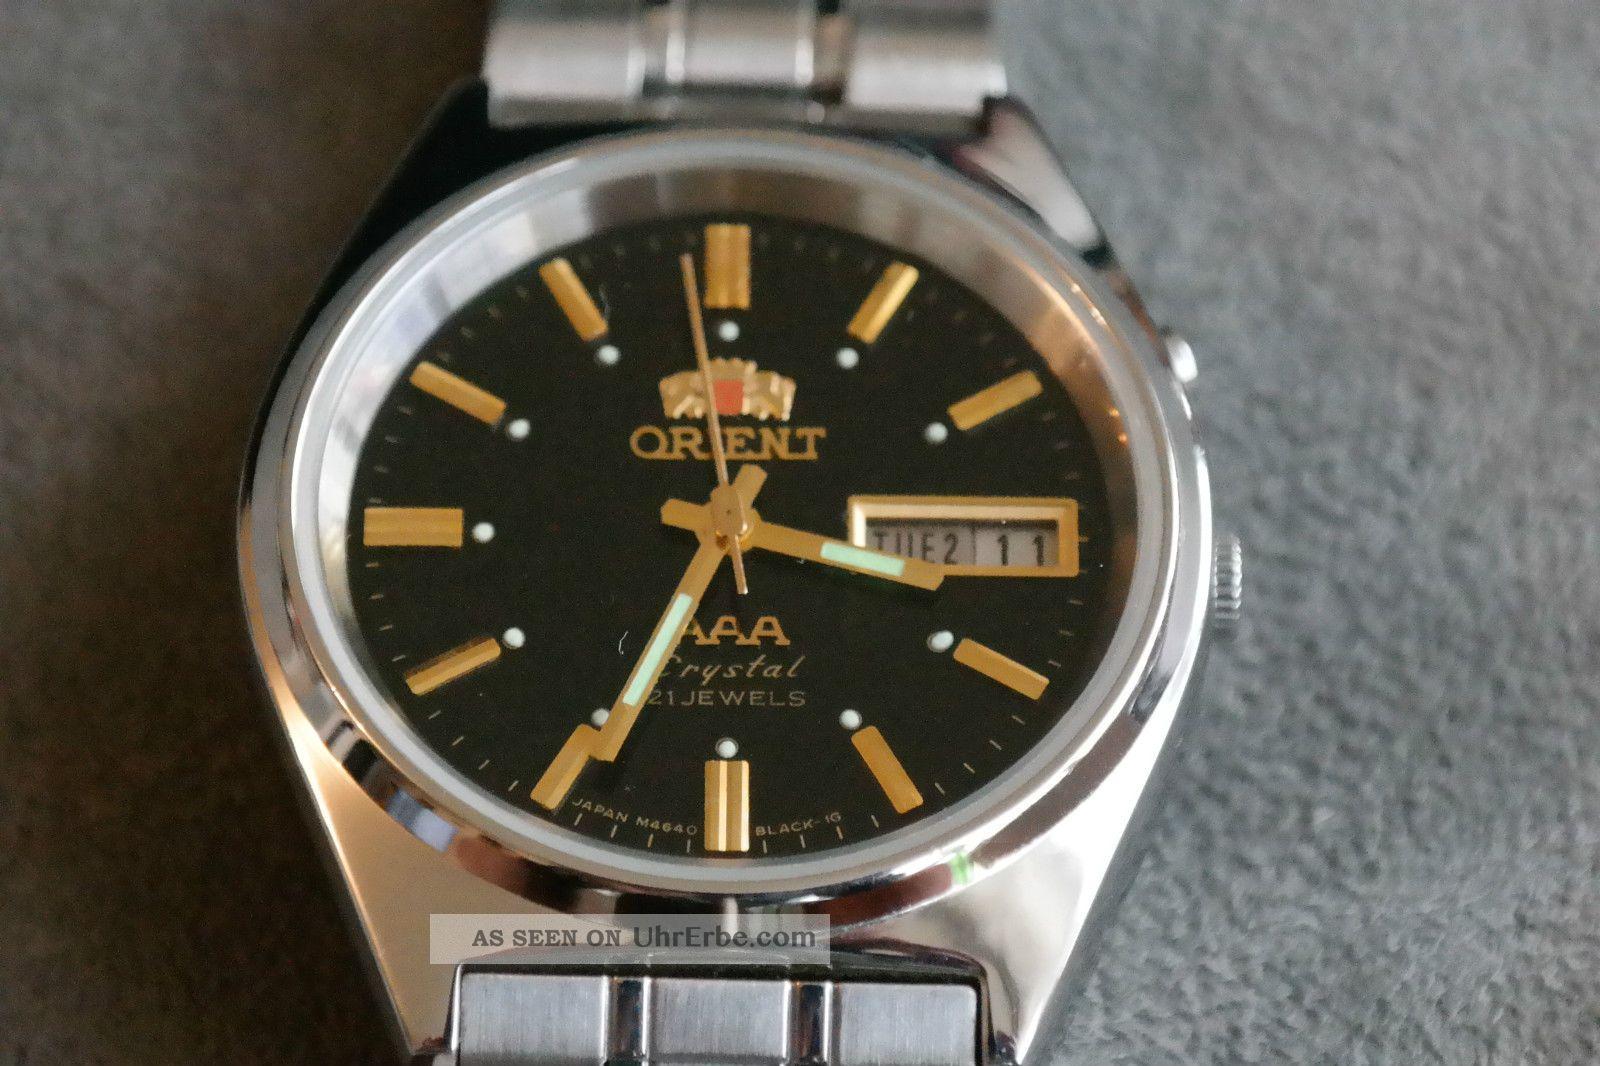 Orient Aaa Automatic Schwarzes Zifferblatt L469649 Edelstahlband Armbanduhren Bild